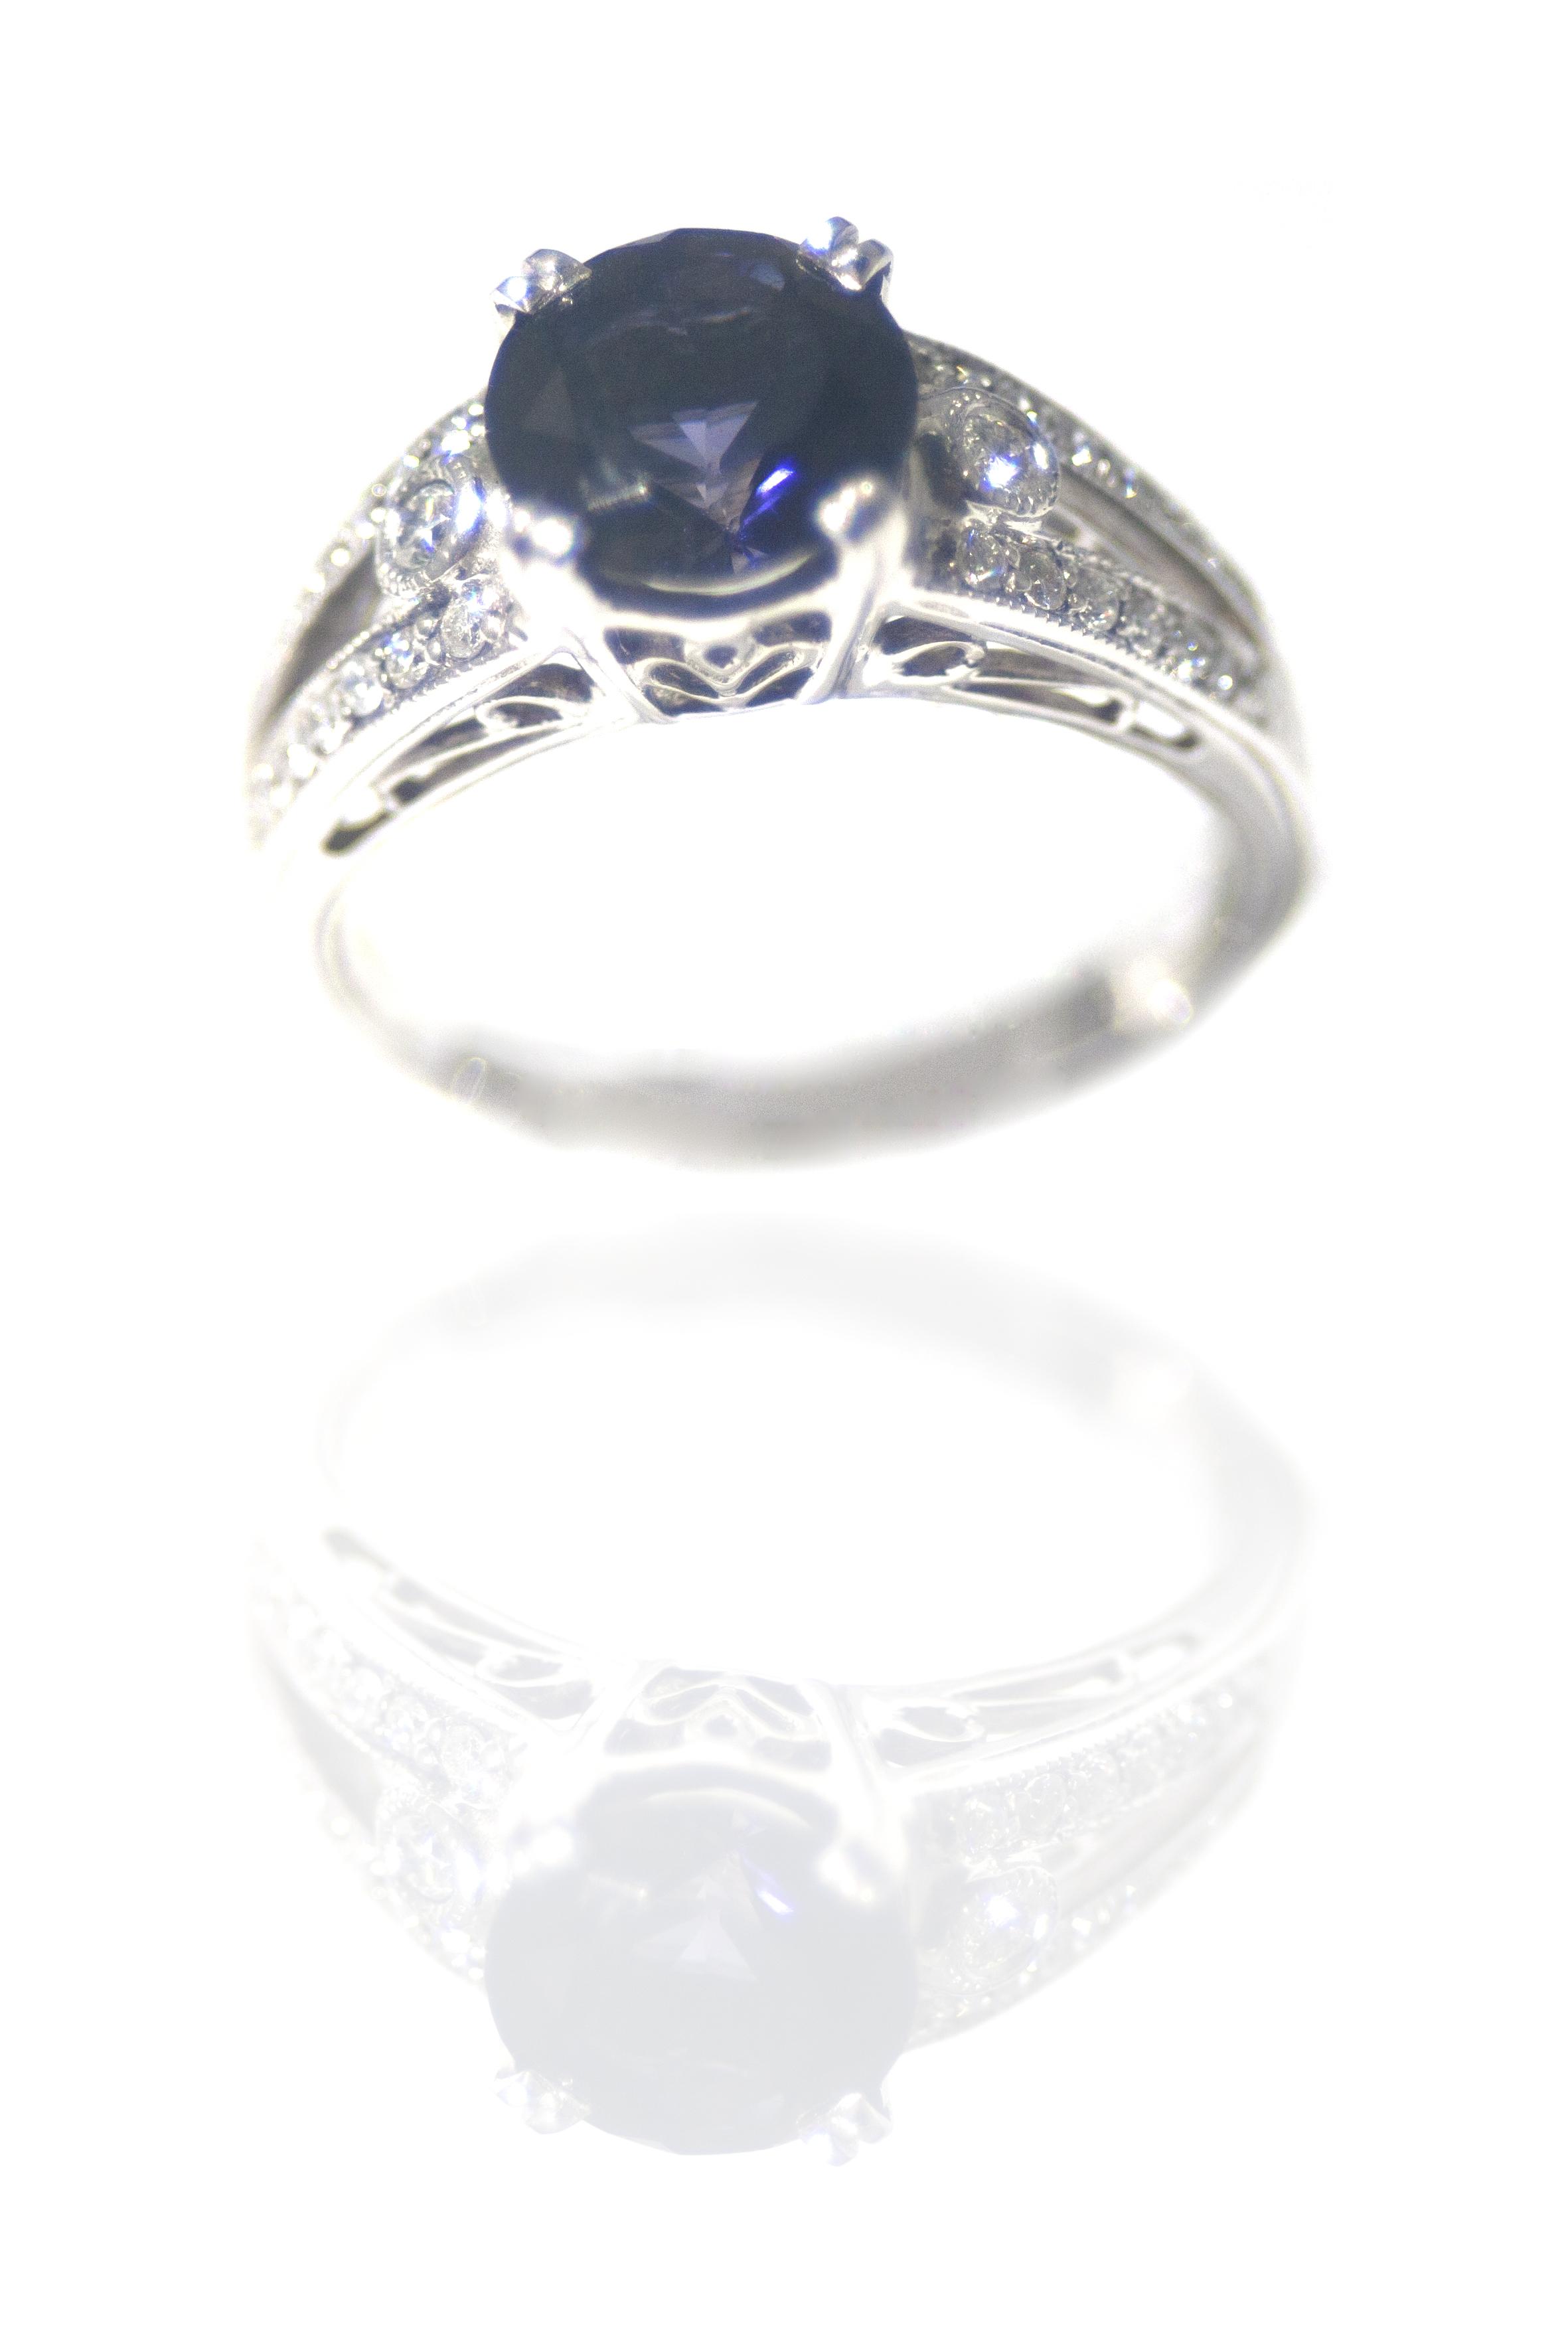 A unique semi-precious gem!